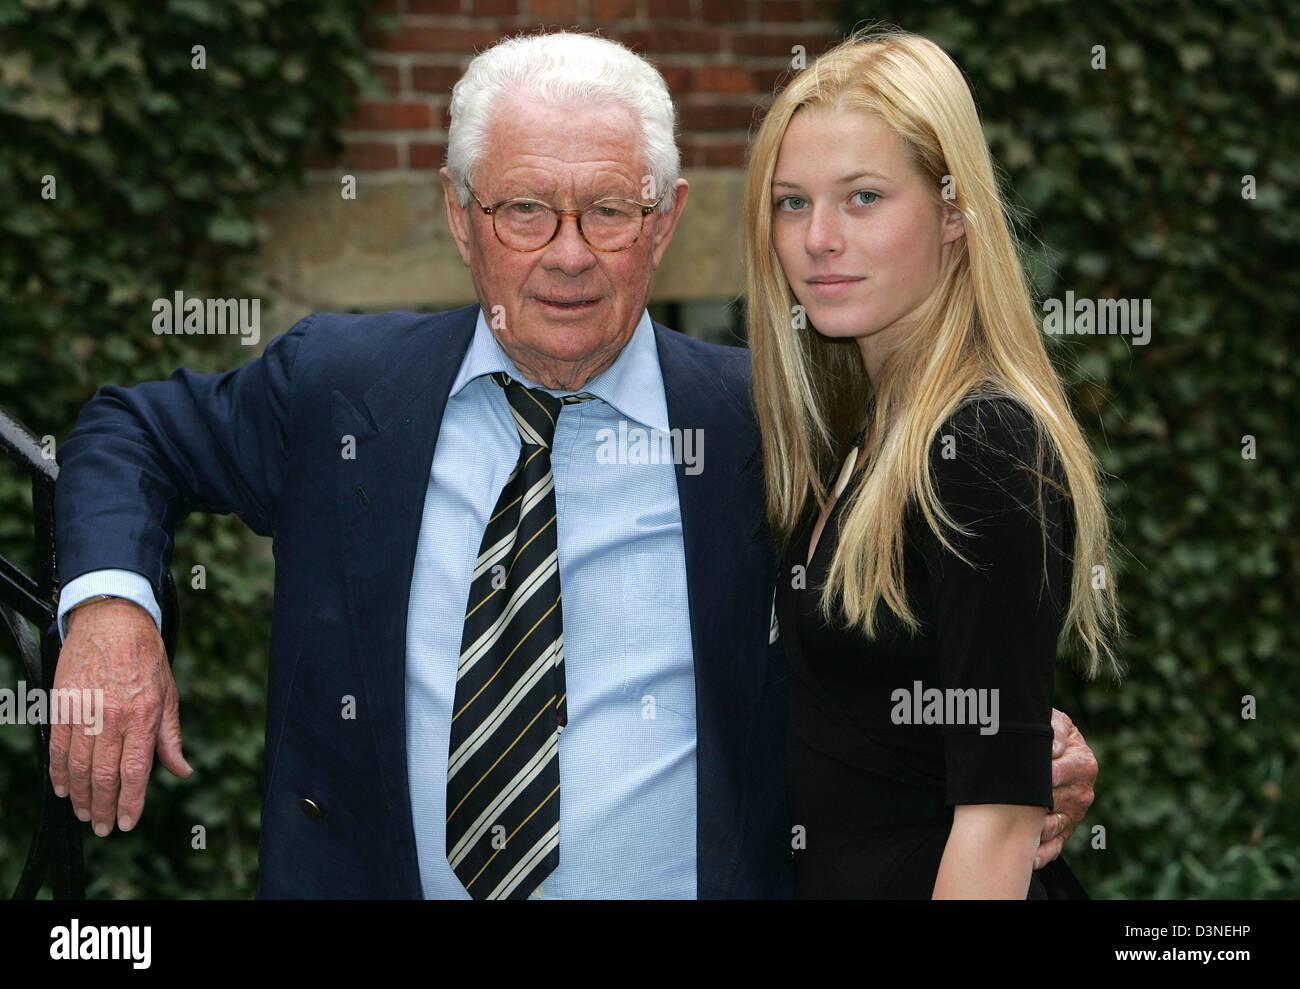 david hamilton David Hamilton, famous British photographer, poses with his muse Elodie  Durand (20)